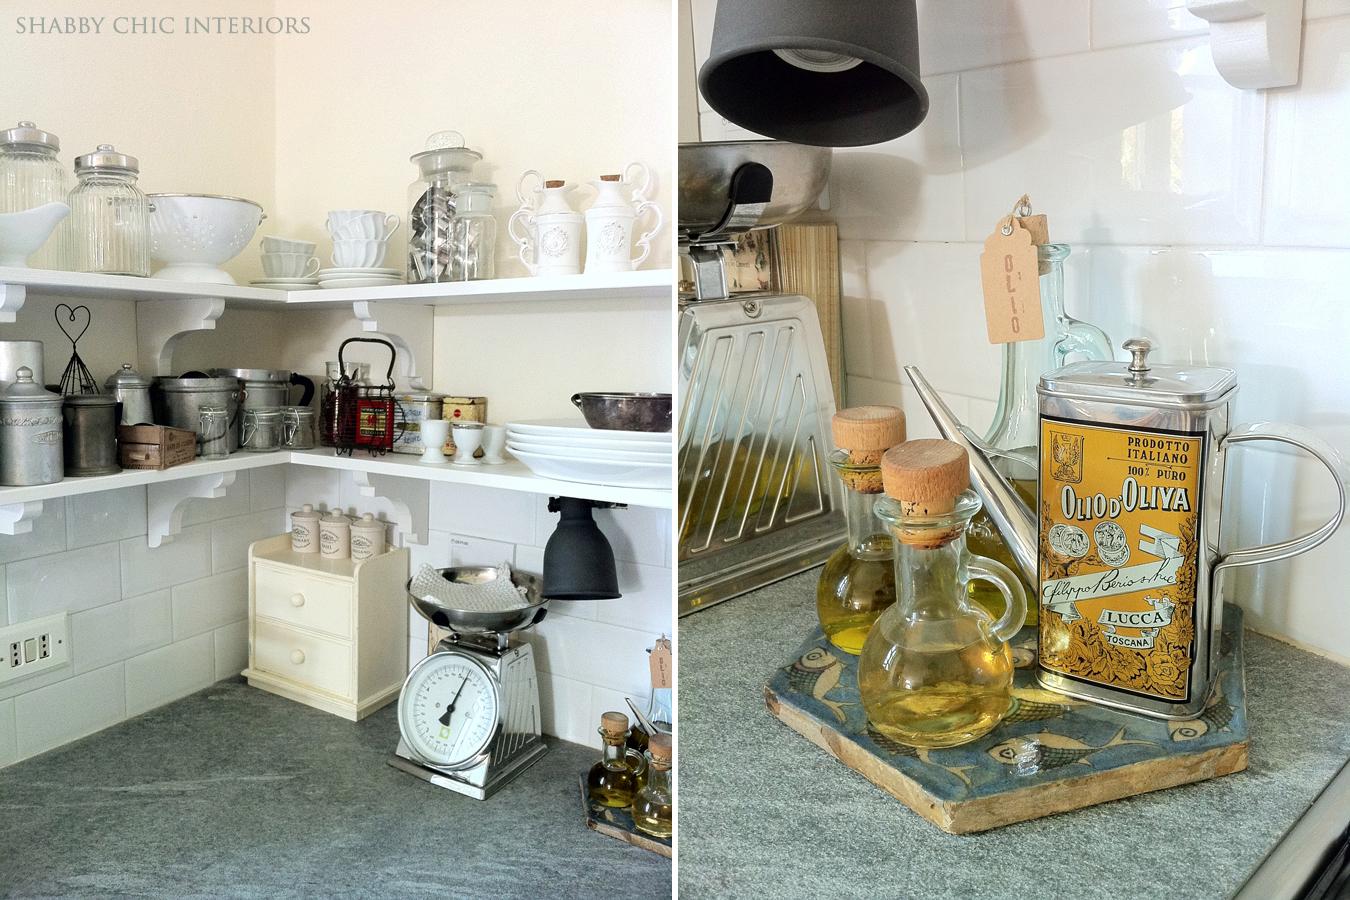 Mensole Cucina Country | Cucina In Stile Country Anche In Versione ...